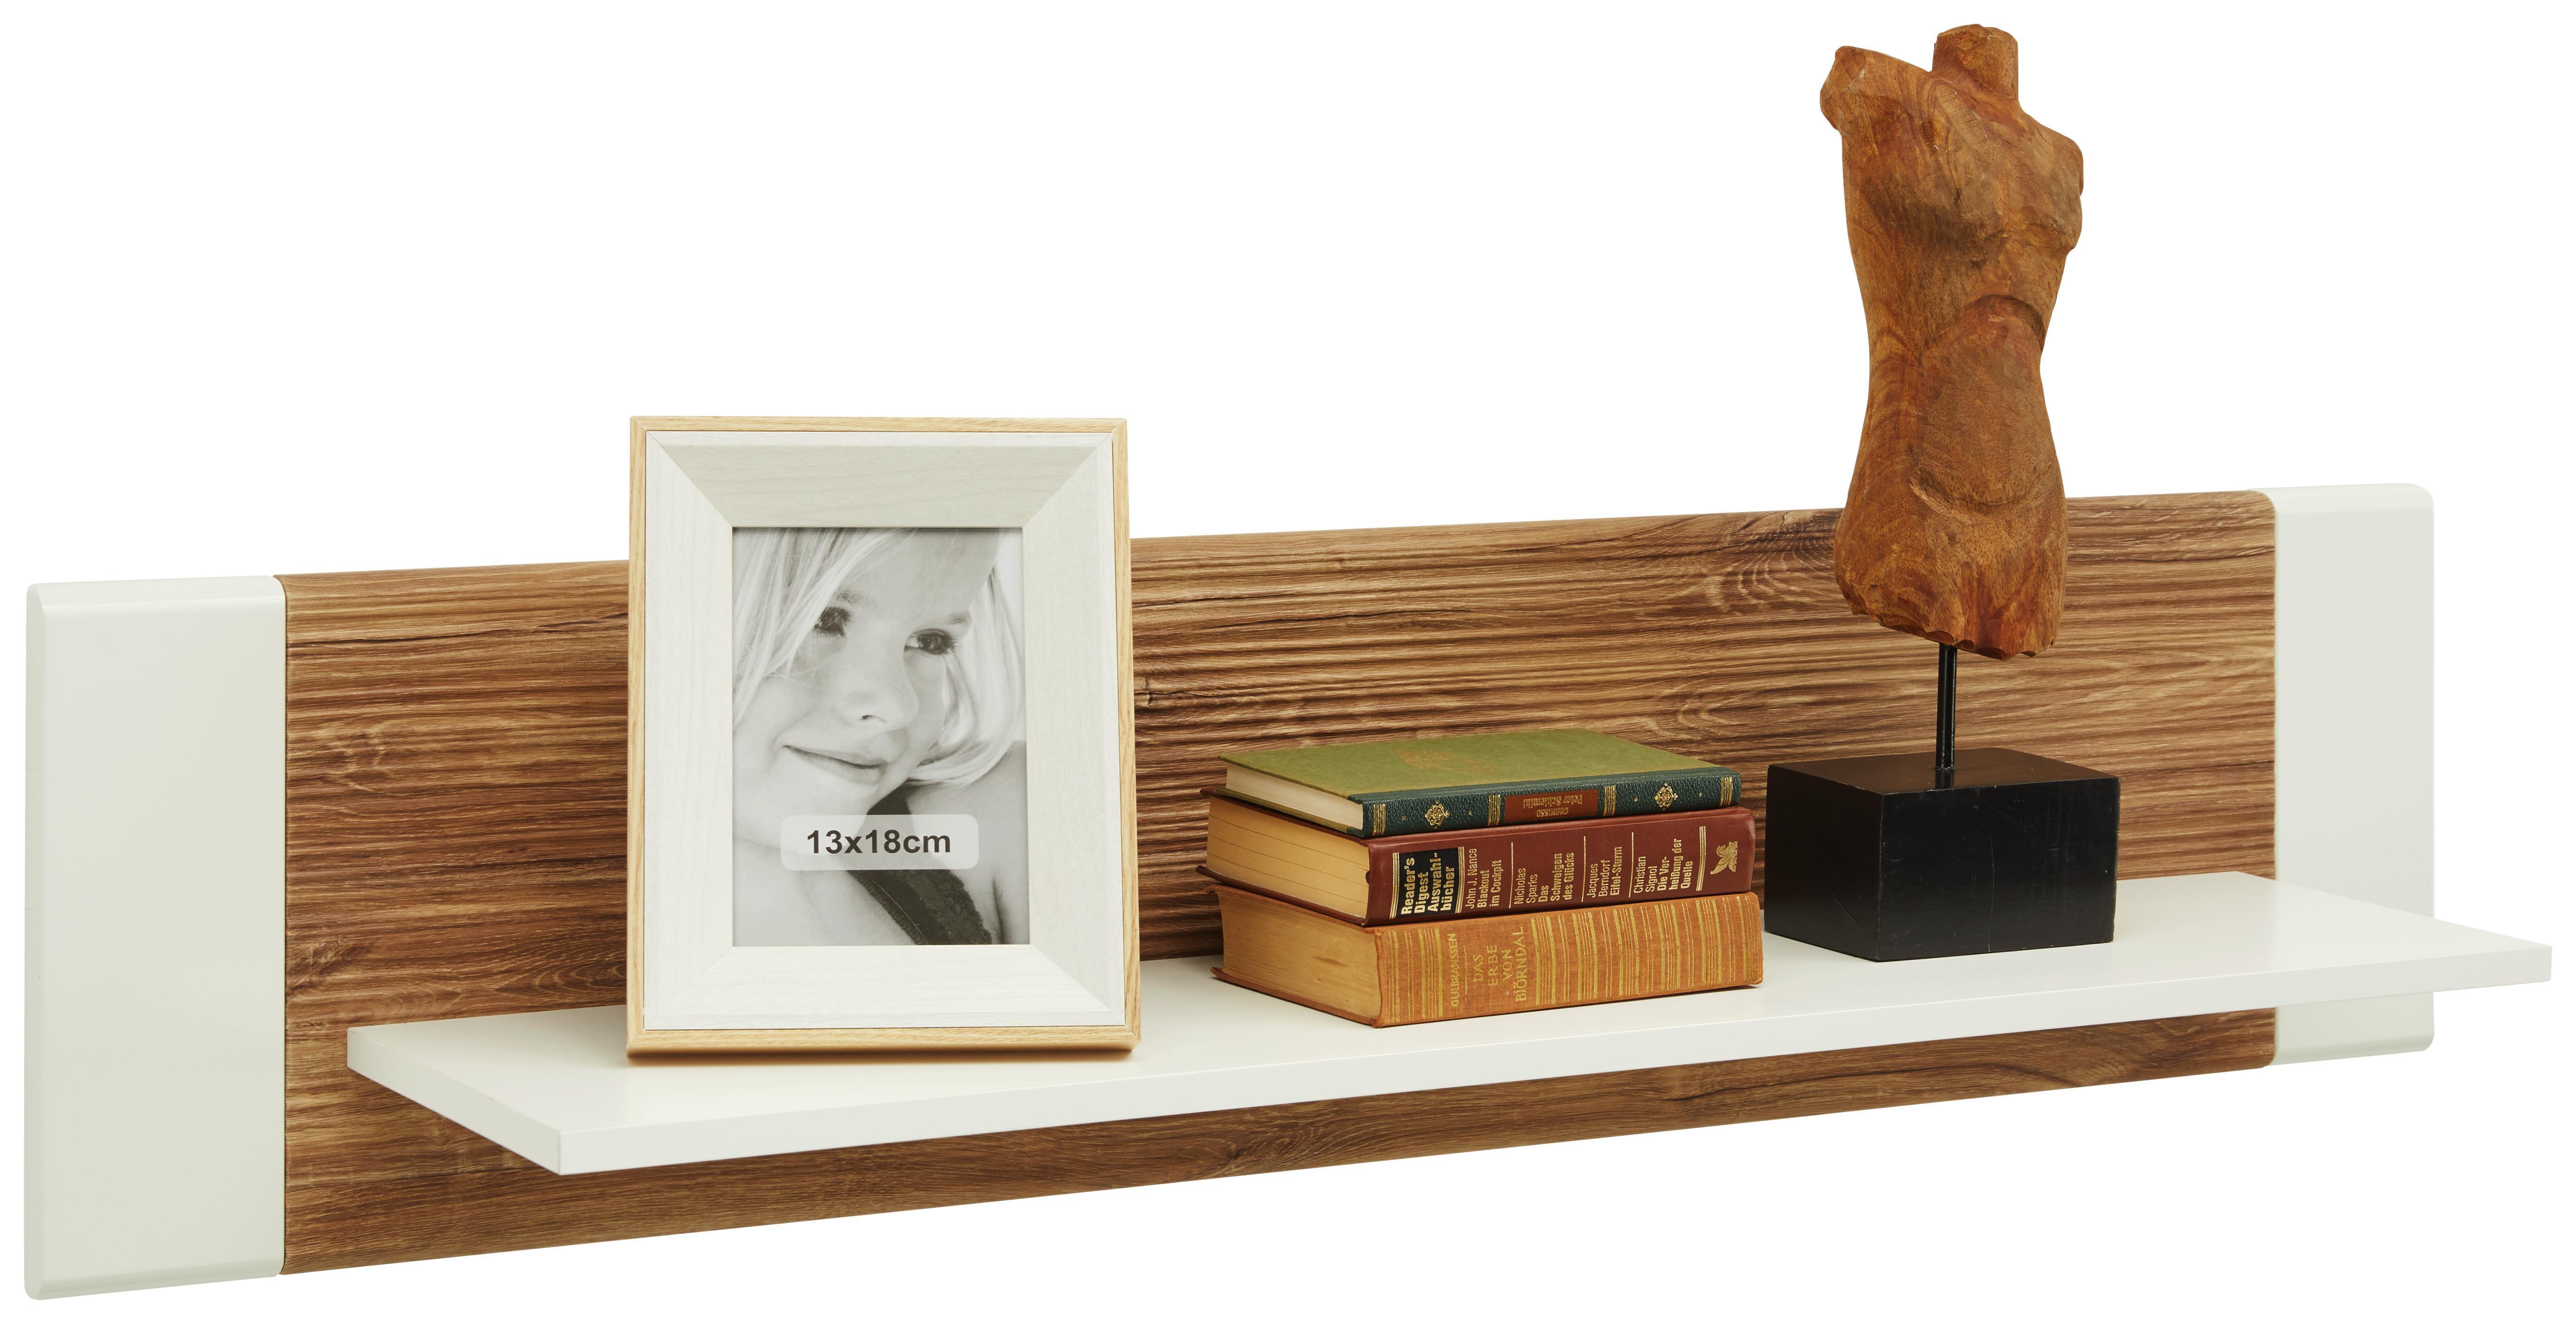 Kaminumrandung mit stauraum: kaminumrandung blanko sonder edition